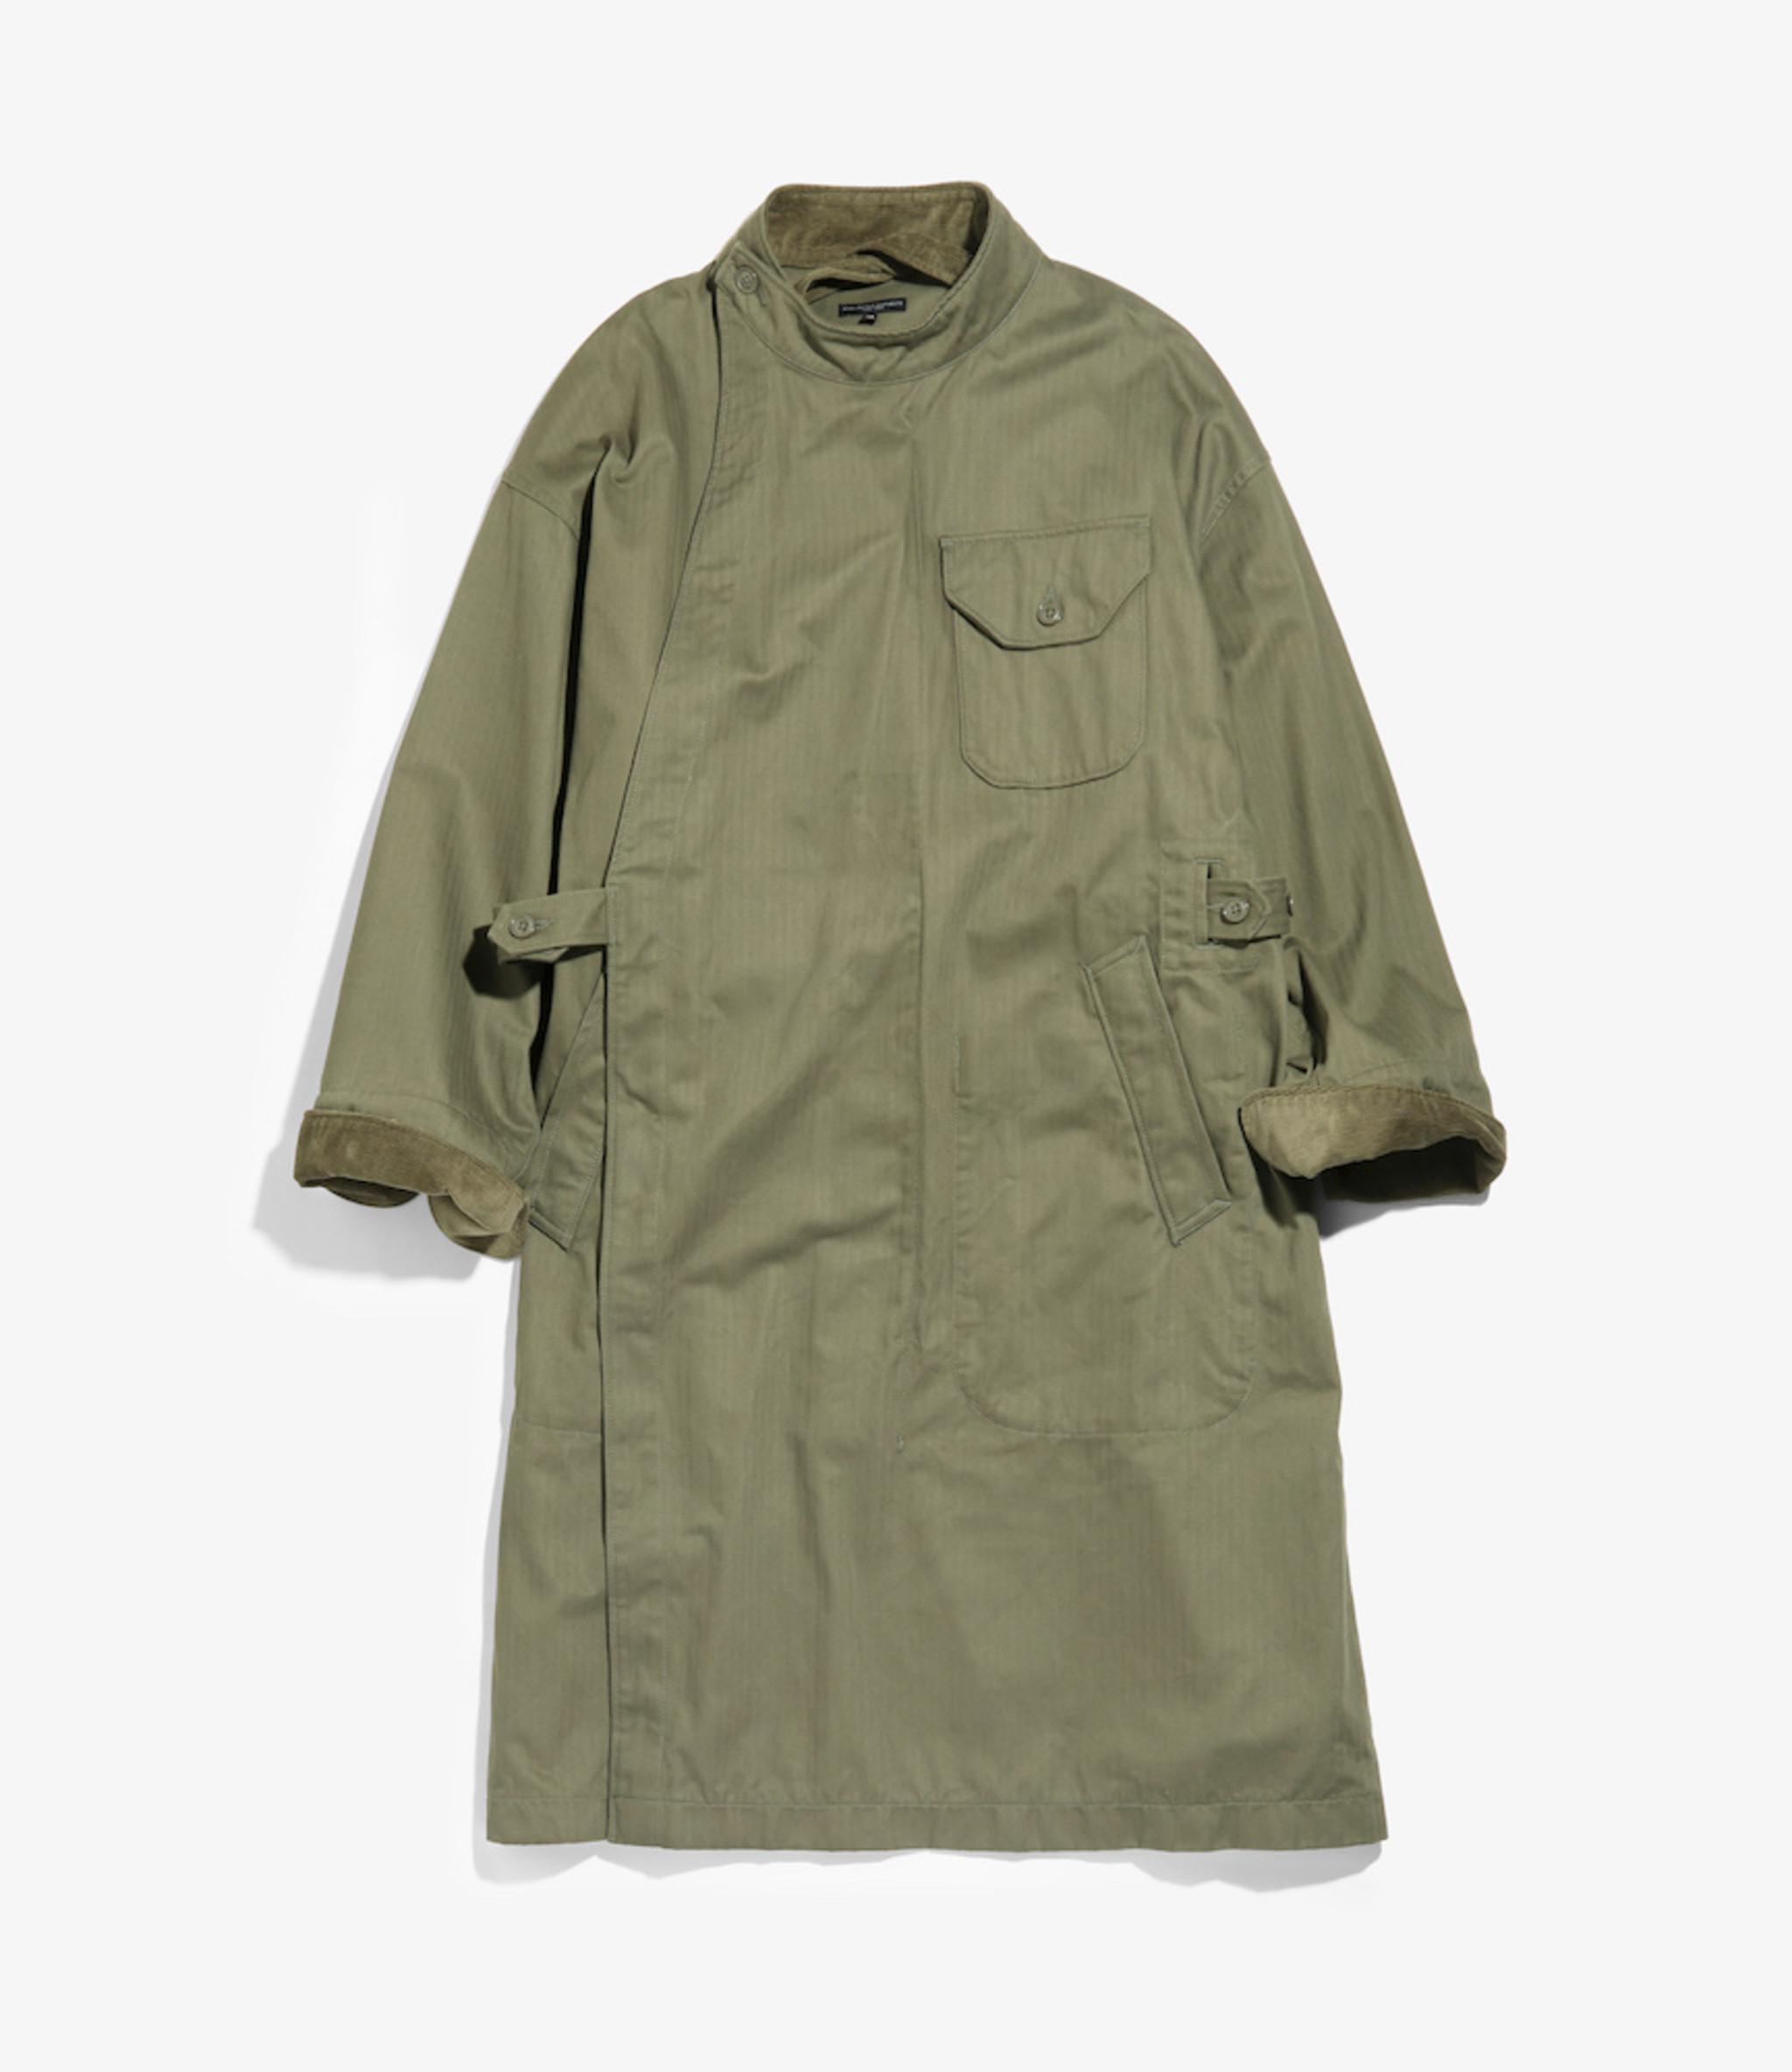 Engineered Garments MG Coat - Olive Cotton Herringbone Twill